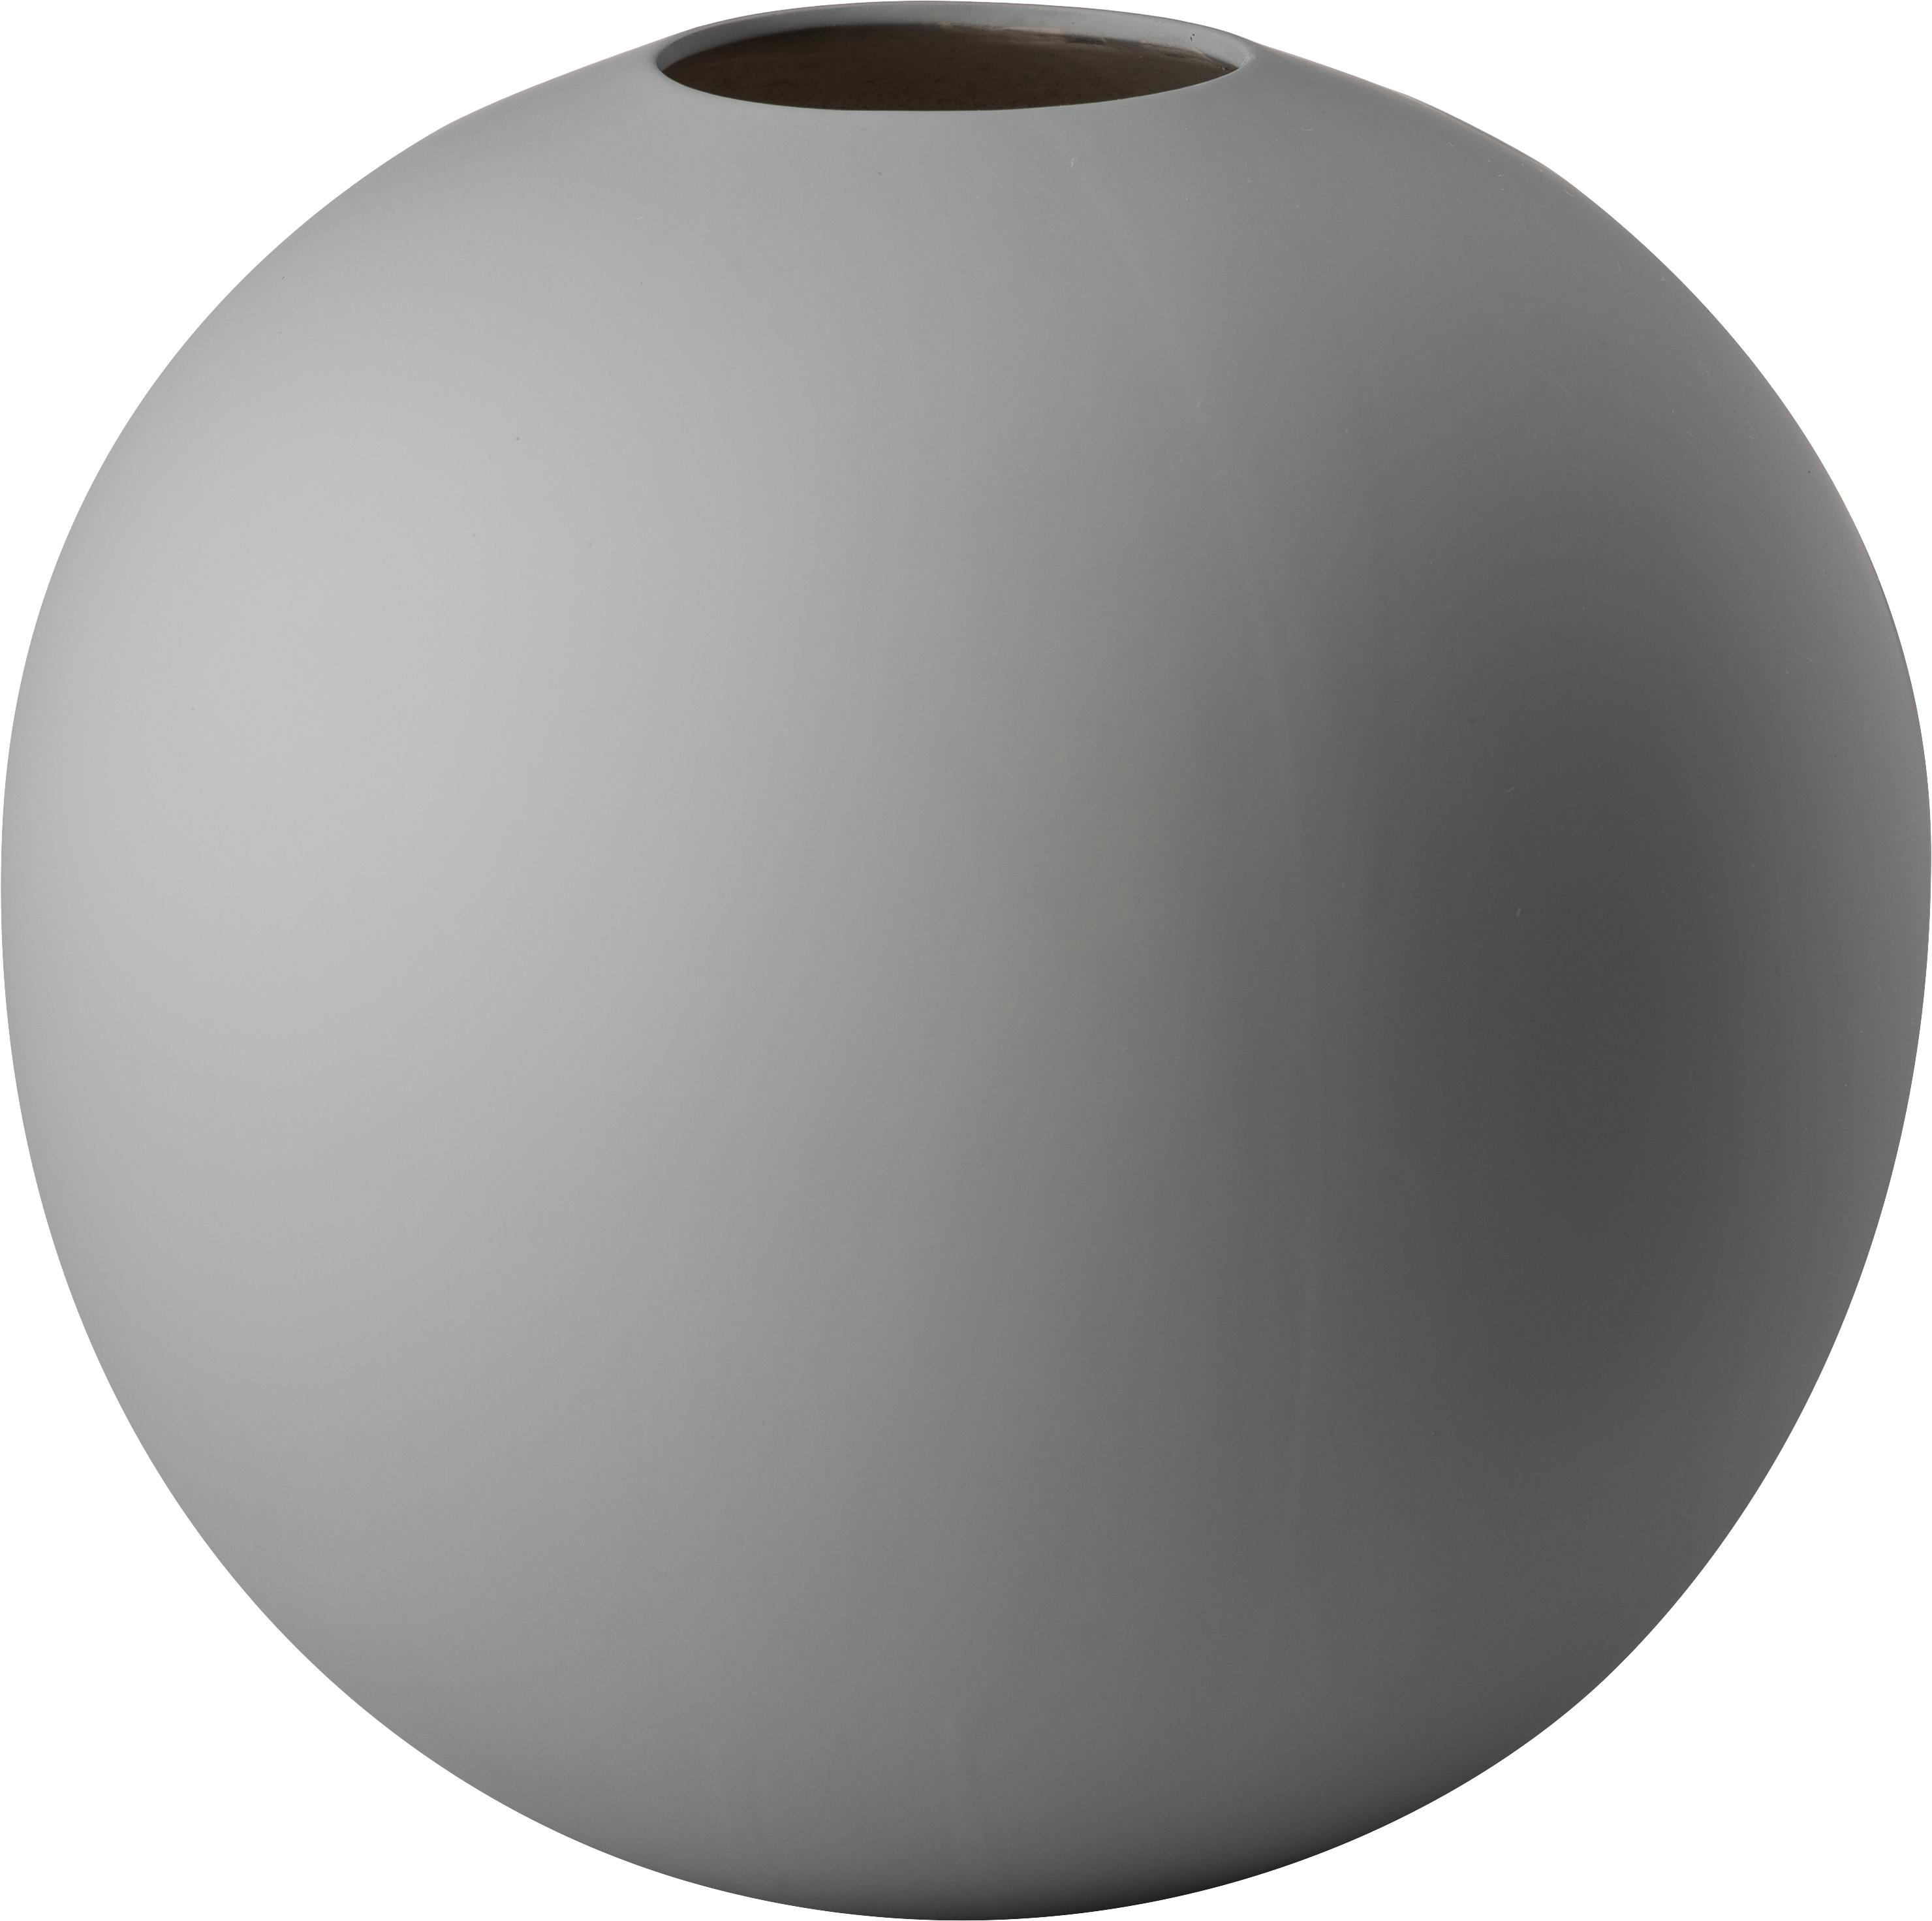 Handgefertigte Kugel-Vase Ball, Keramik, Grau, Ø 20 x H 20 cm